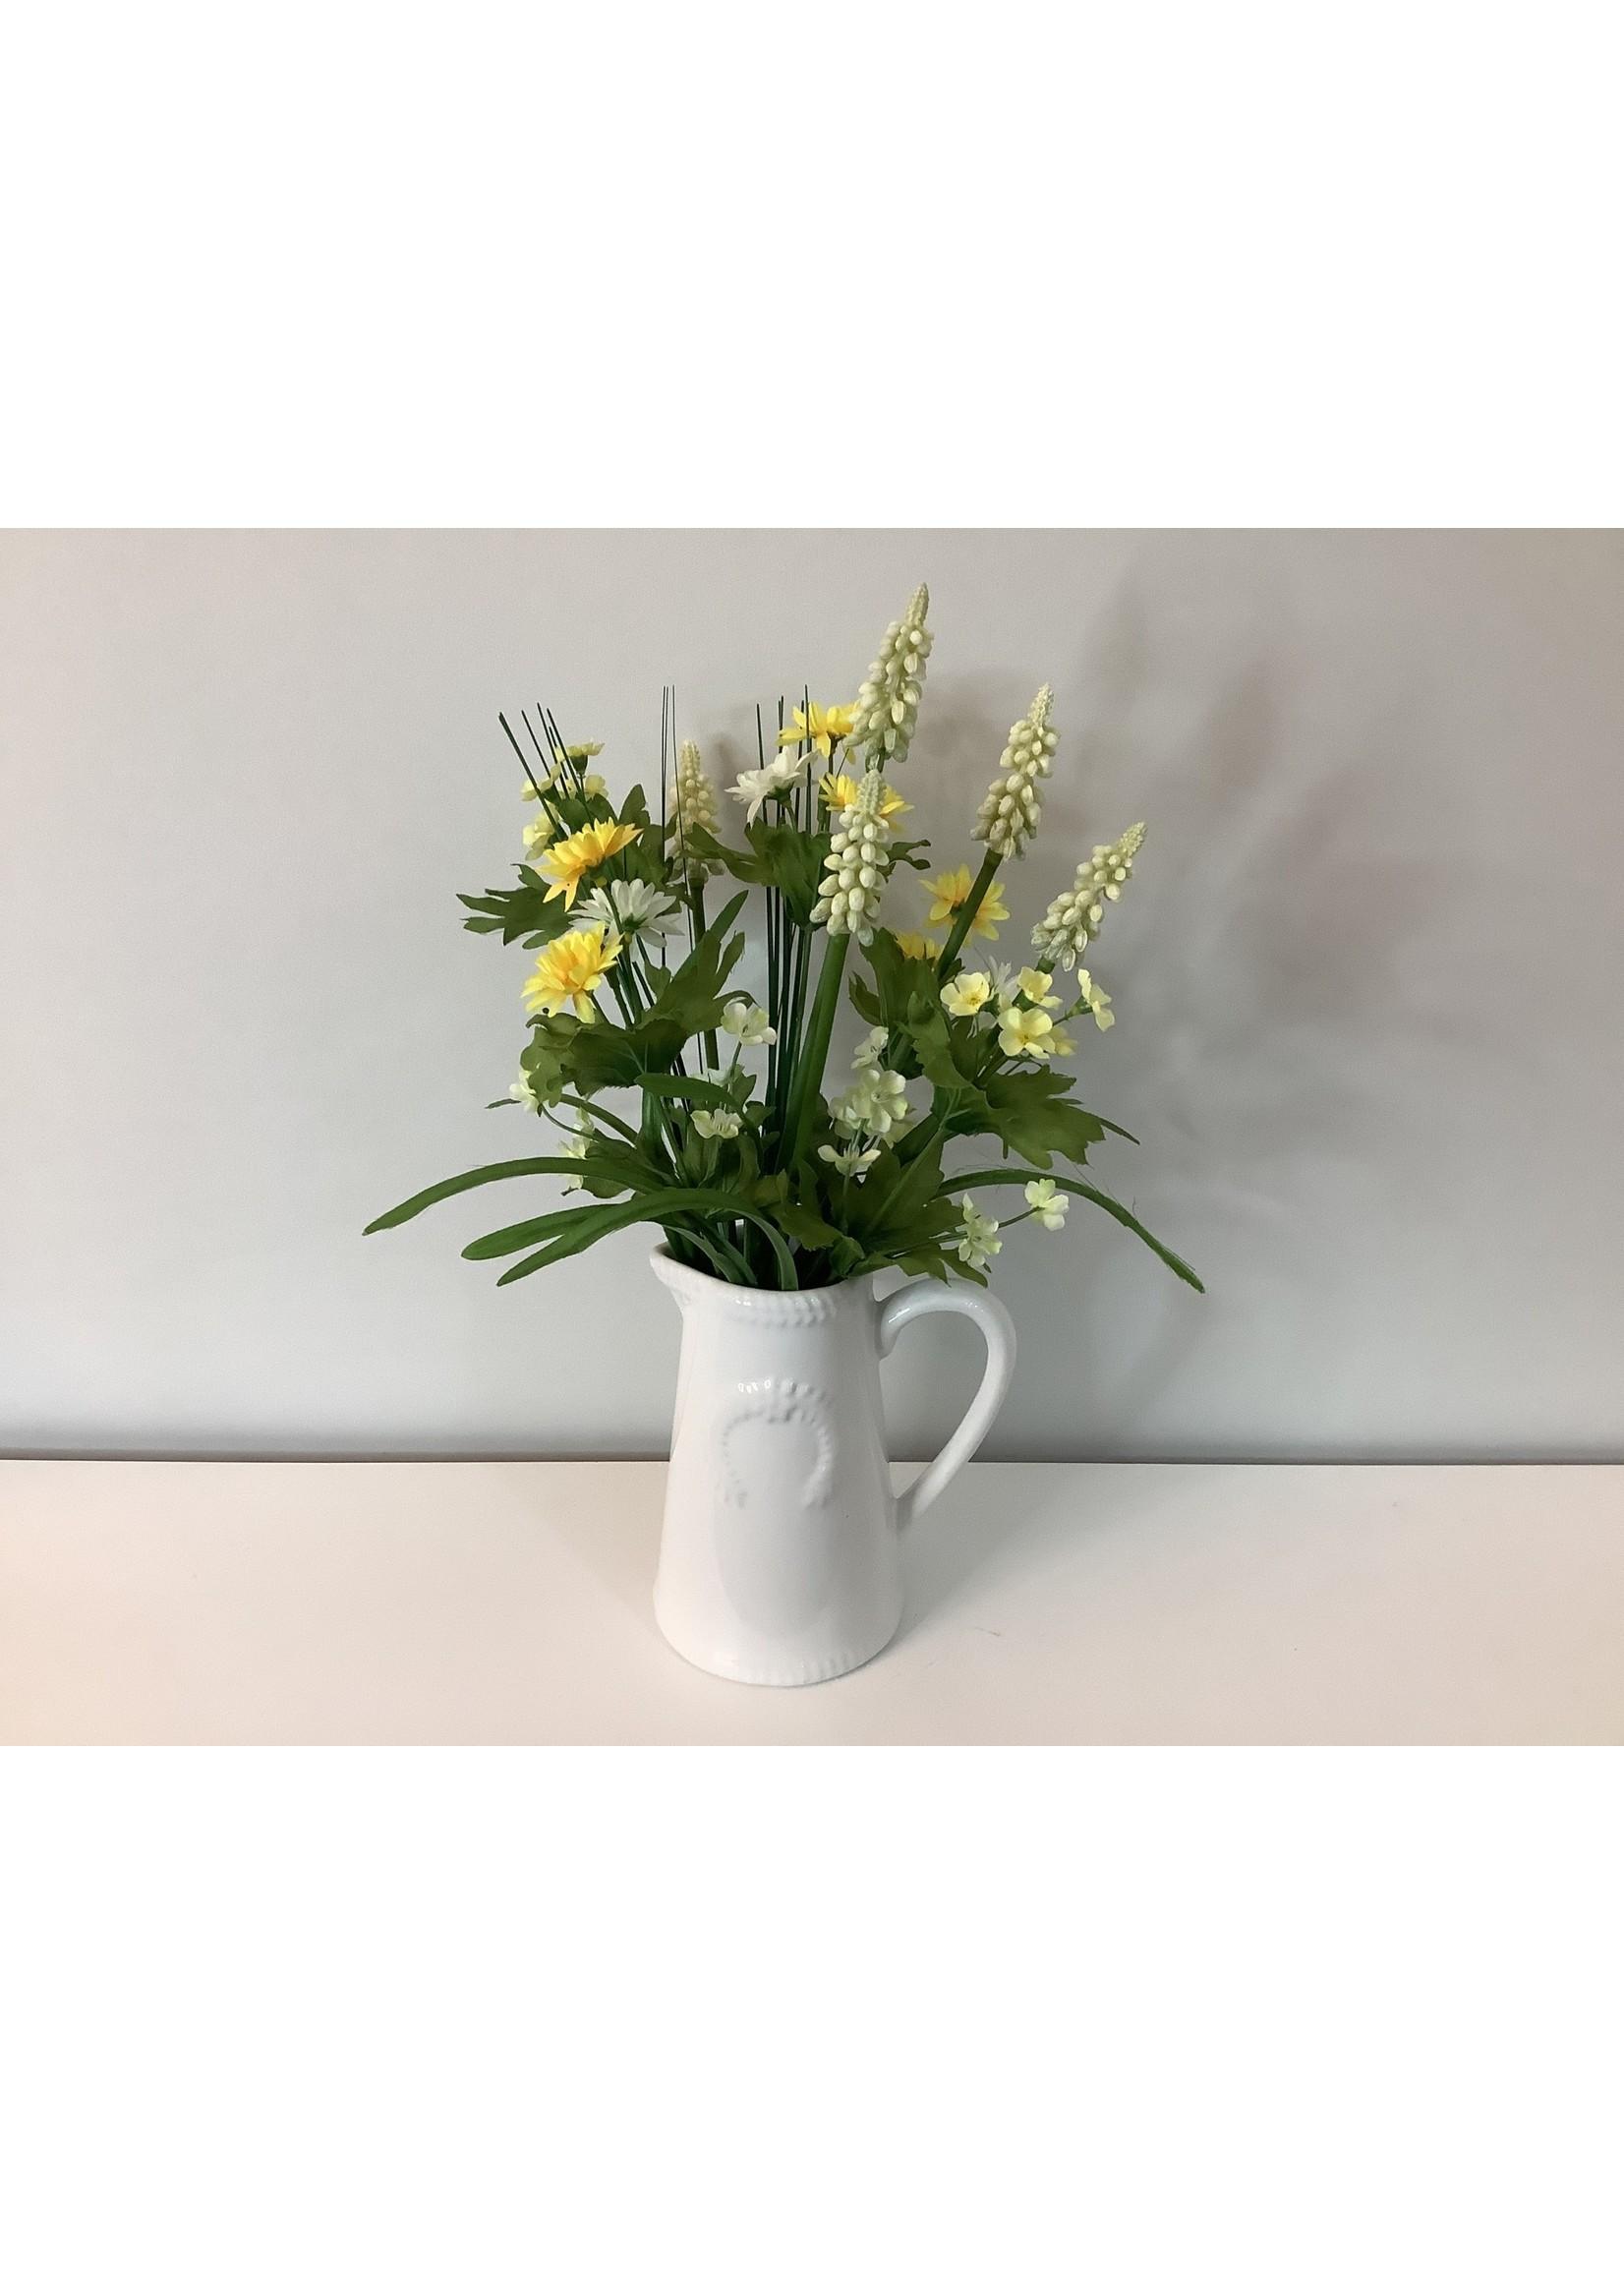 Hyacinth & Daisy in White jug